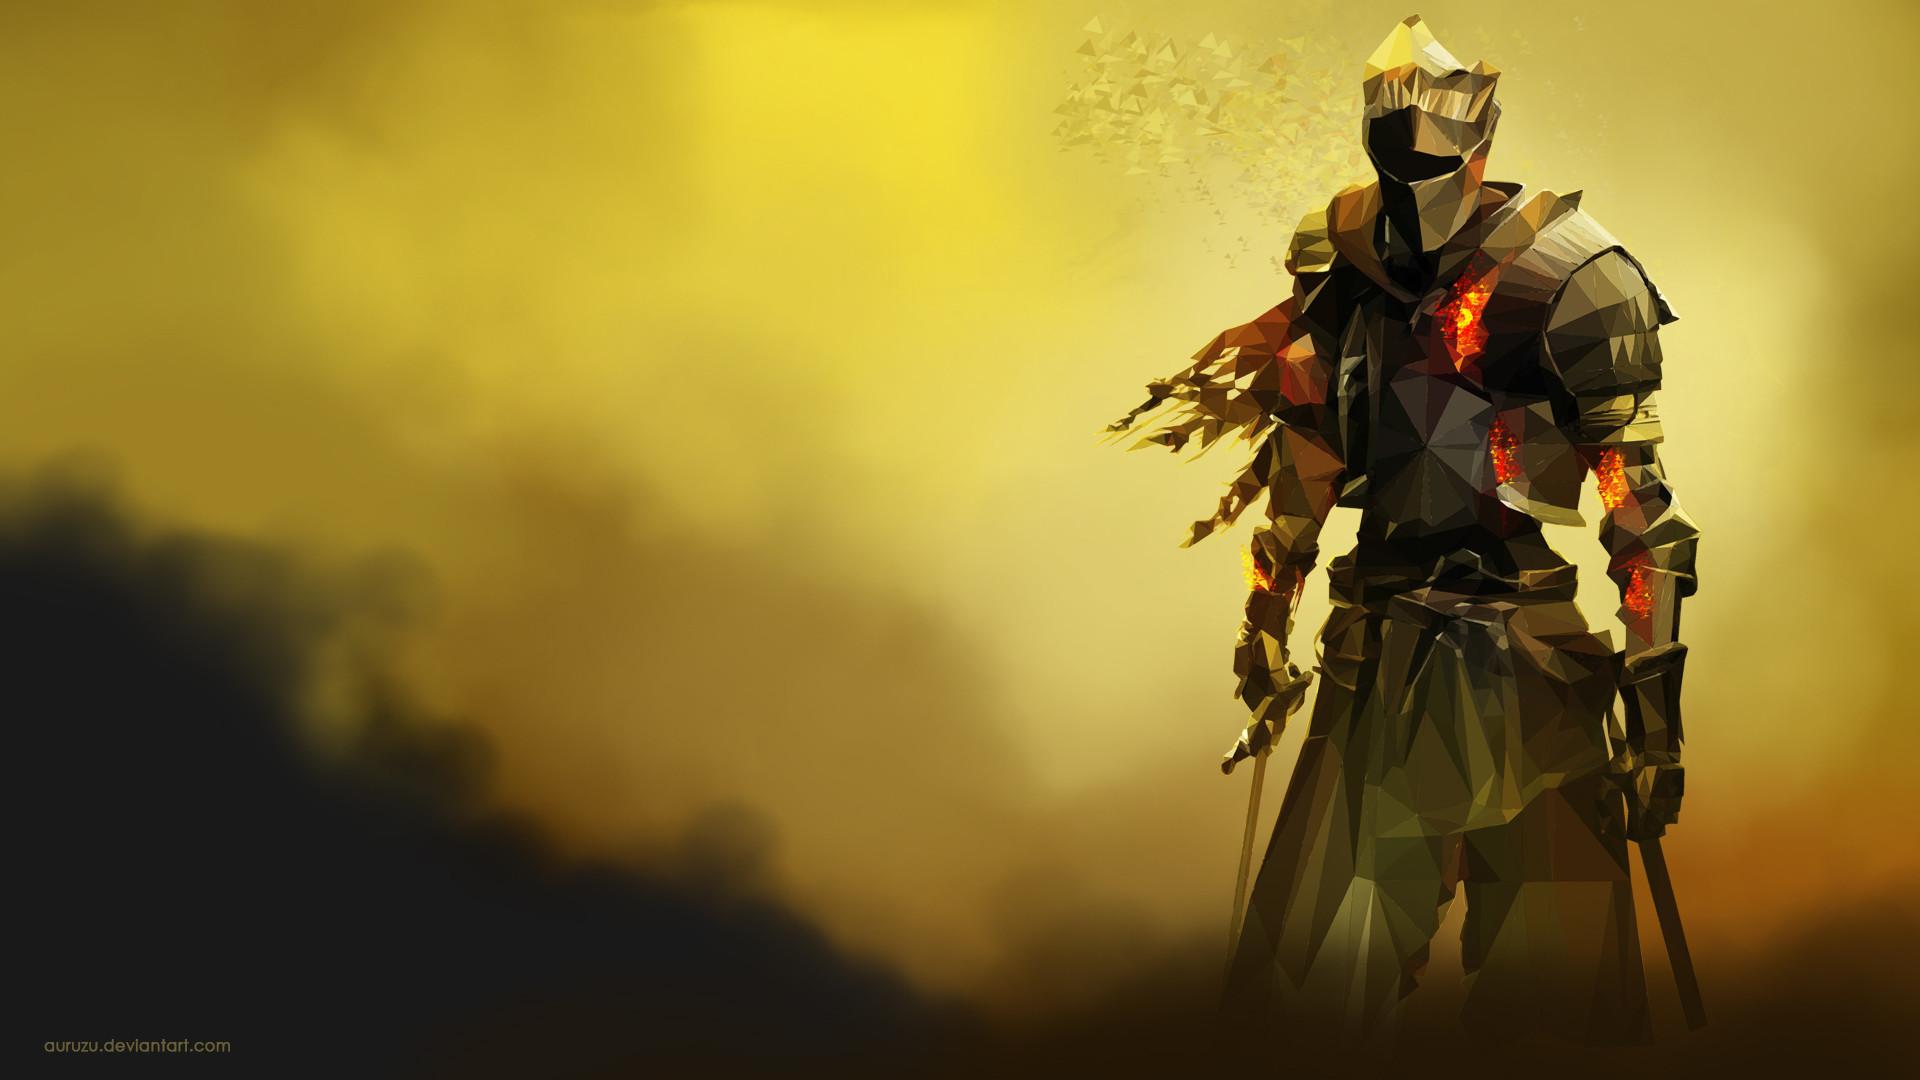 Dark Souls 3 21 9: Dark Souls 3 Wallpaper 1920x1080 (77+ Images